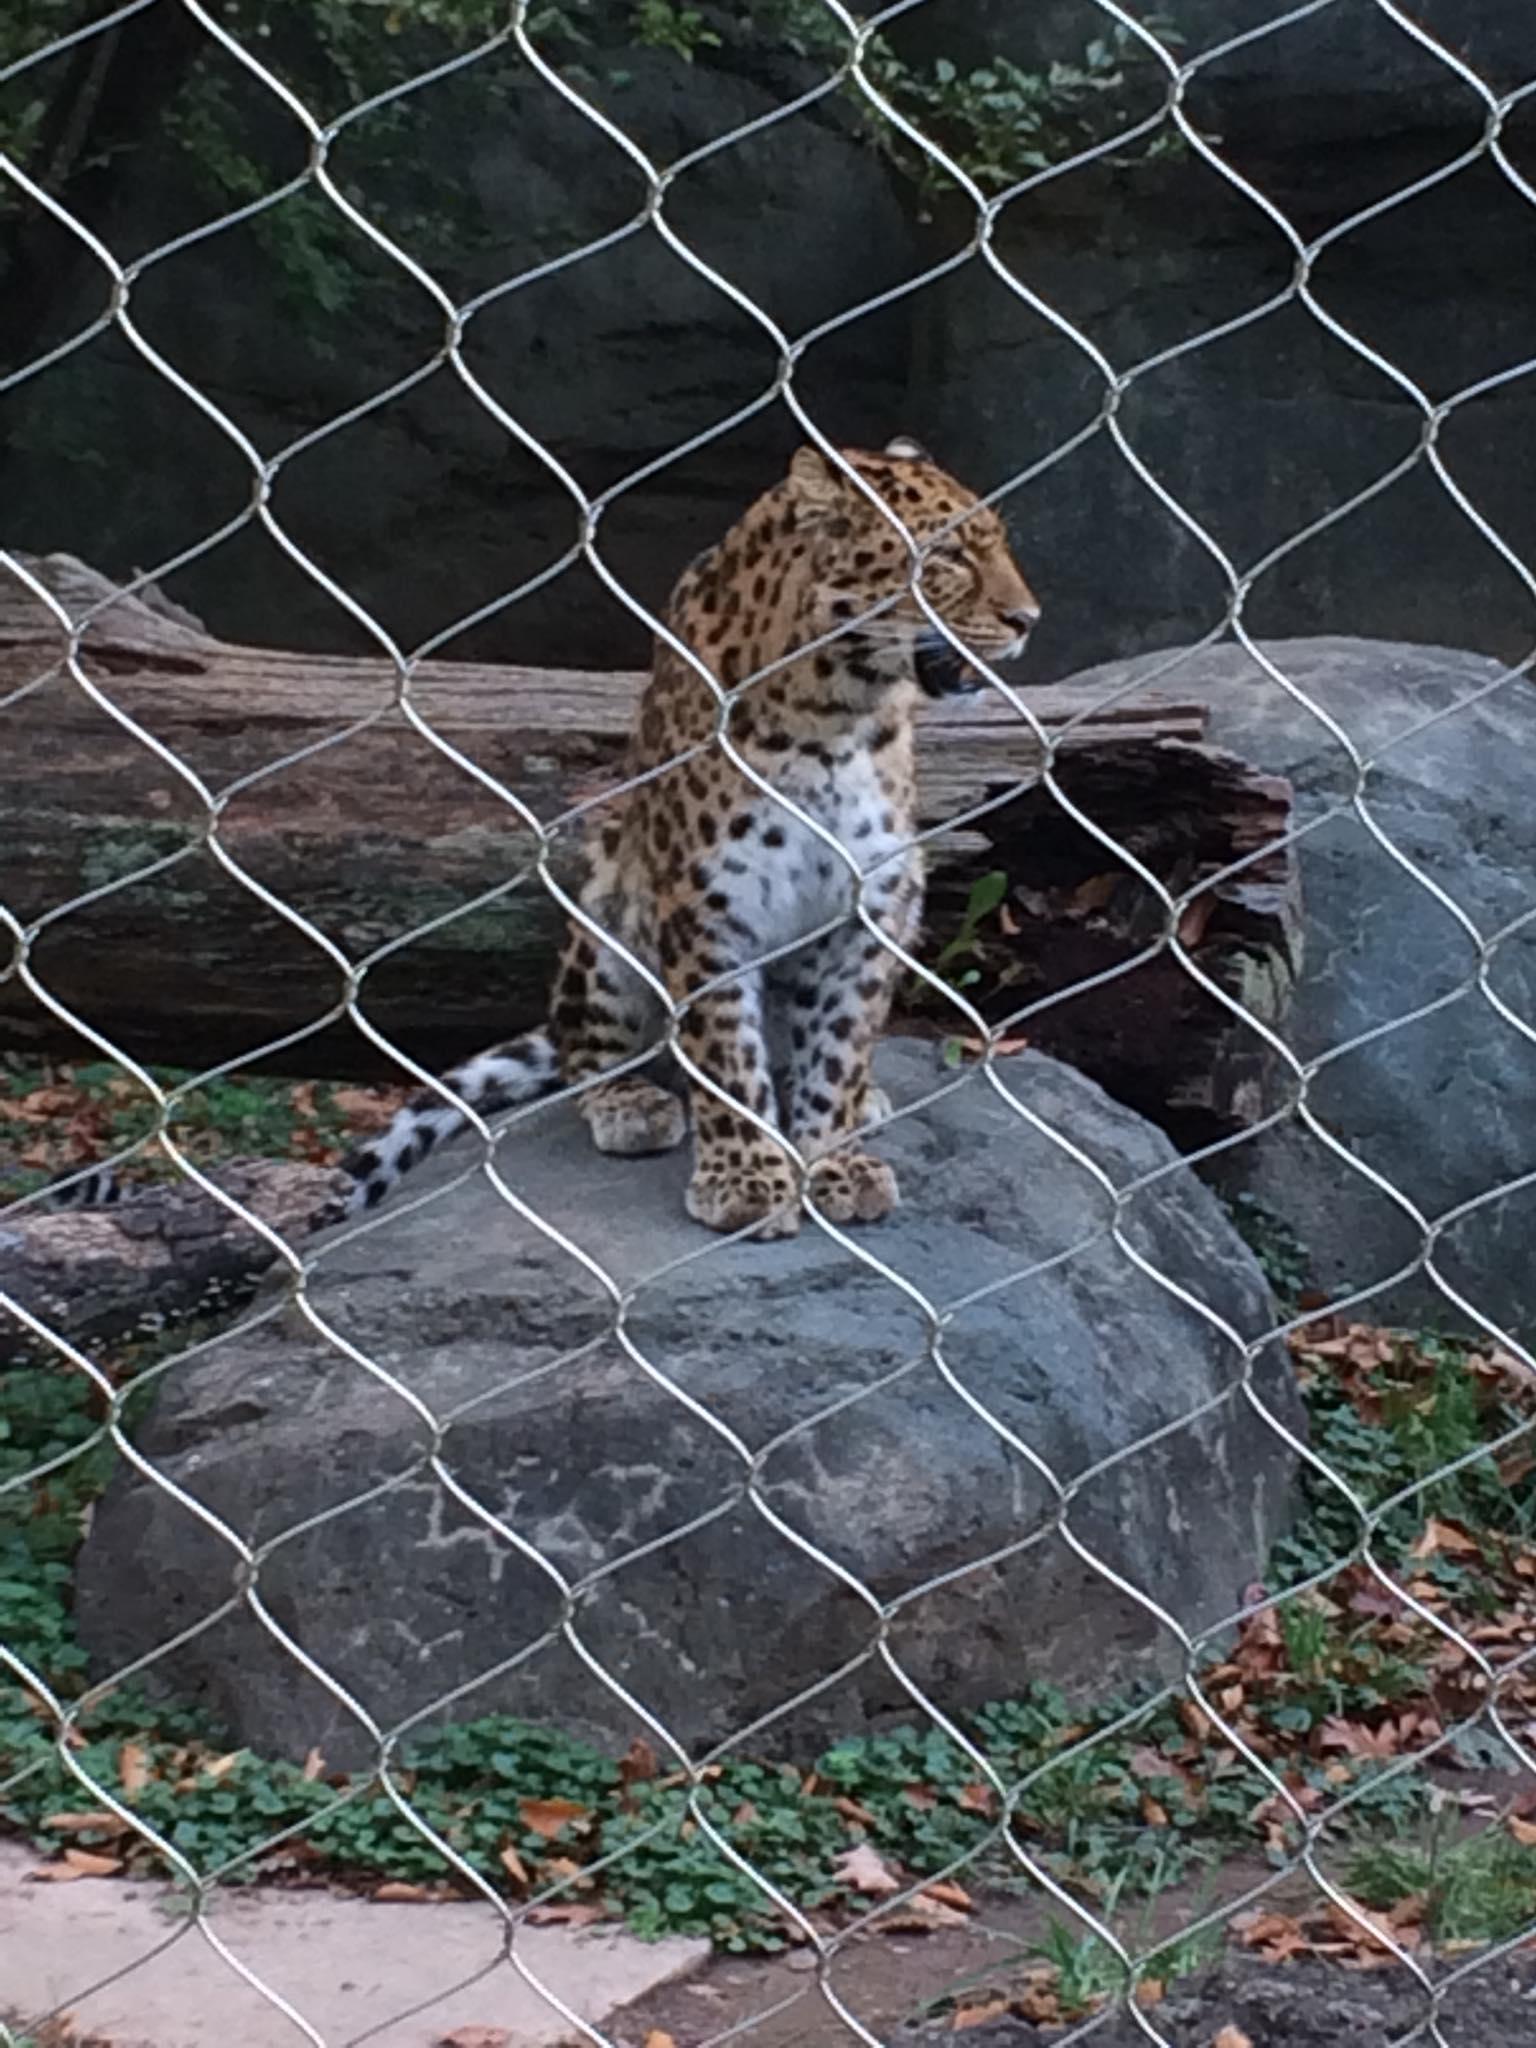 7) leopard